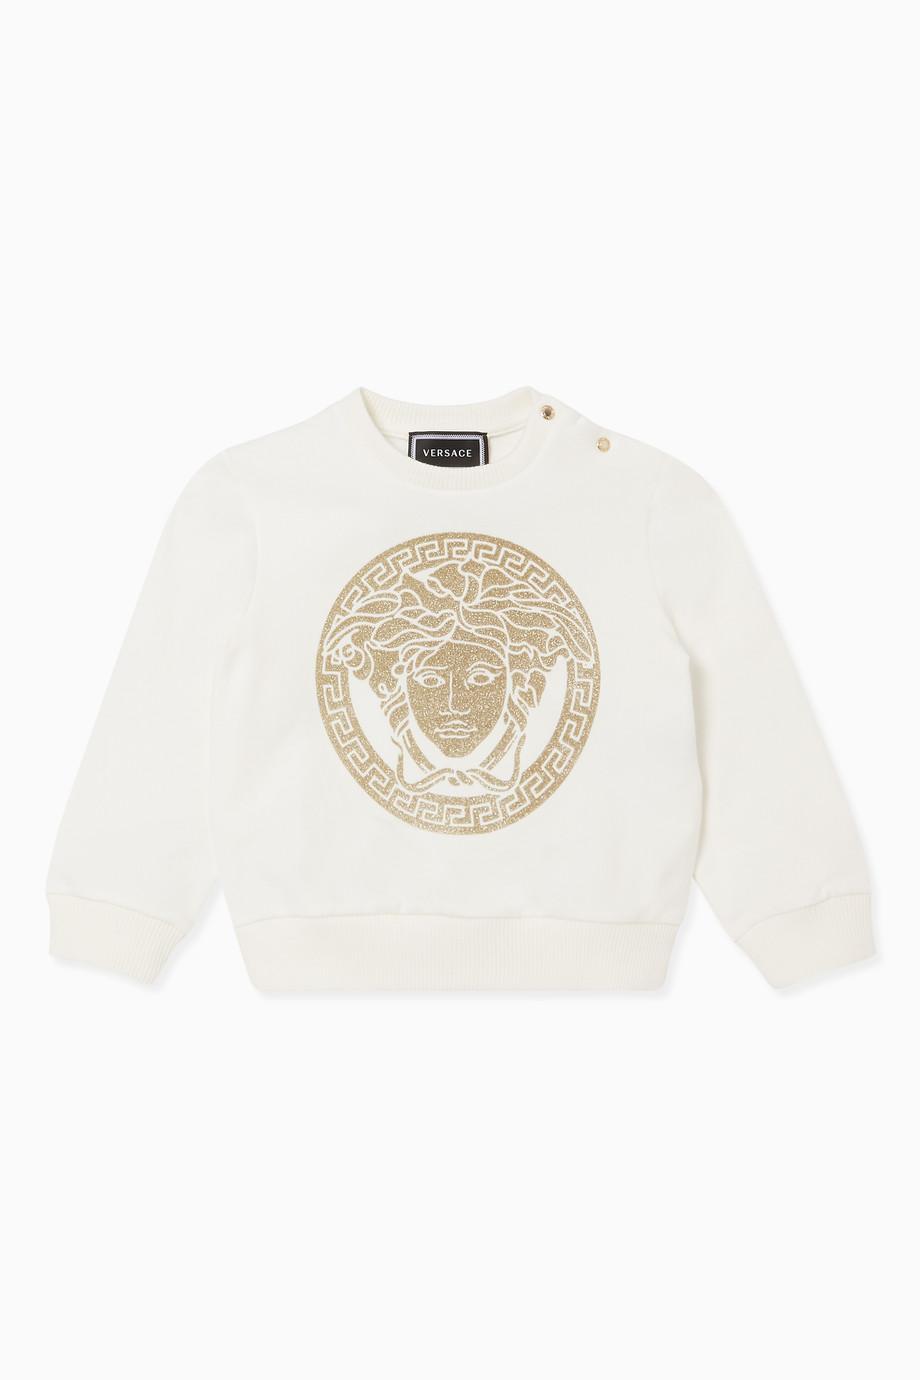 Shop Young Versace White Medusa Logo Print Sweatshirt for